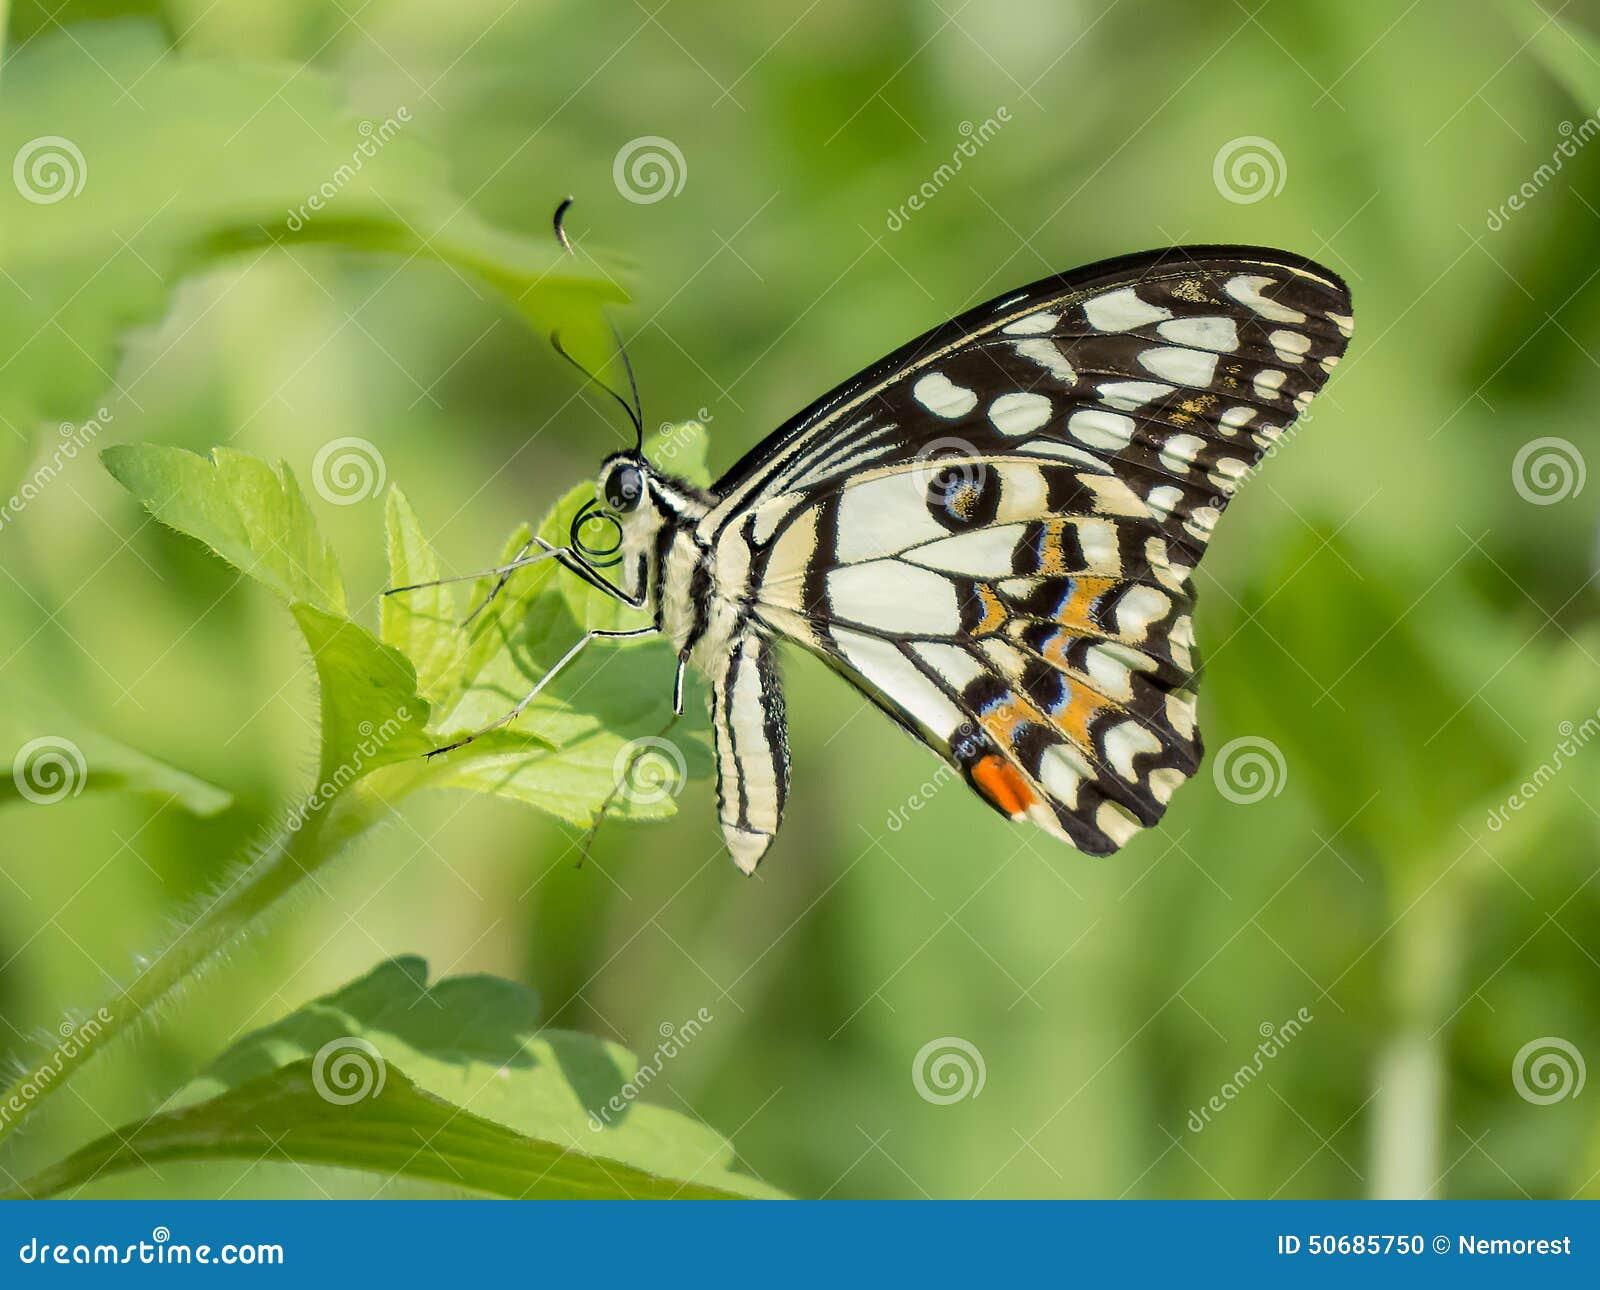 Download 蝴蝶 库存照片. 图片 包括有 触手, 热带, 本质, 飞行, 昆虫, 眼睛, 栖所, 节肢动物, beautifuler - 50685750